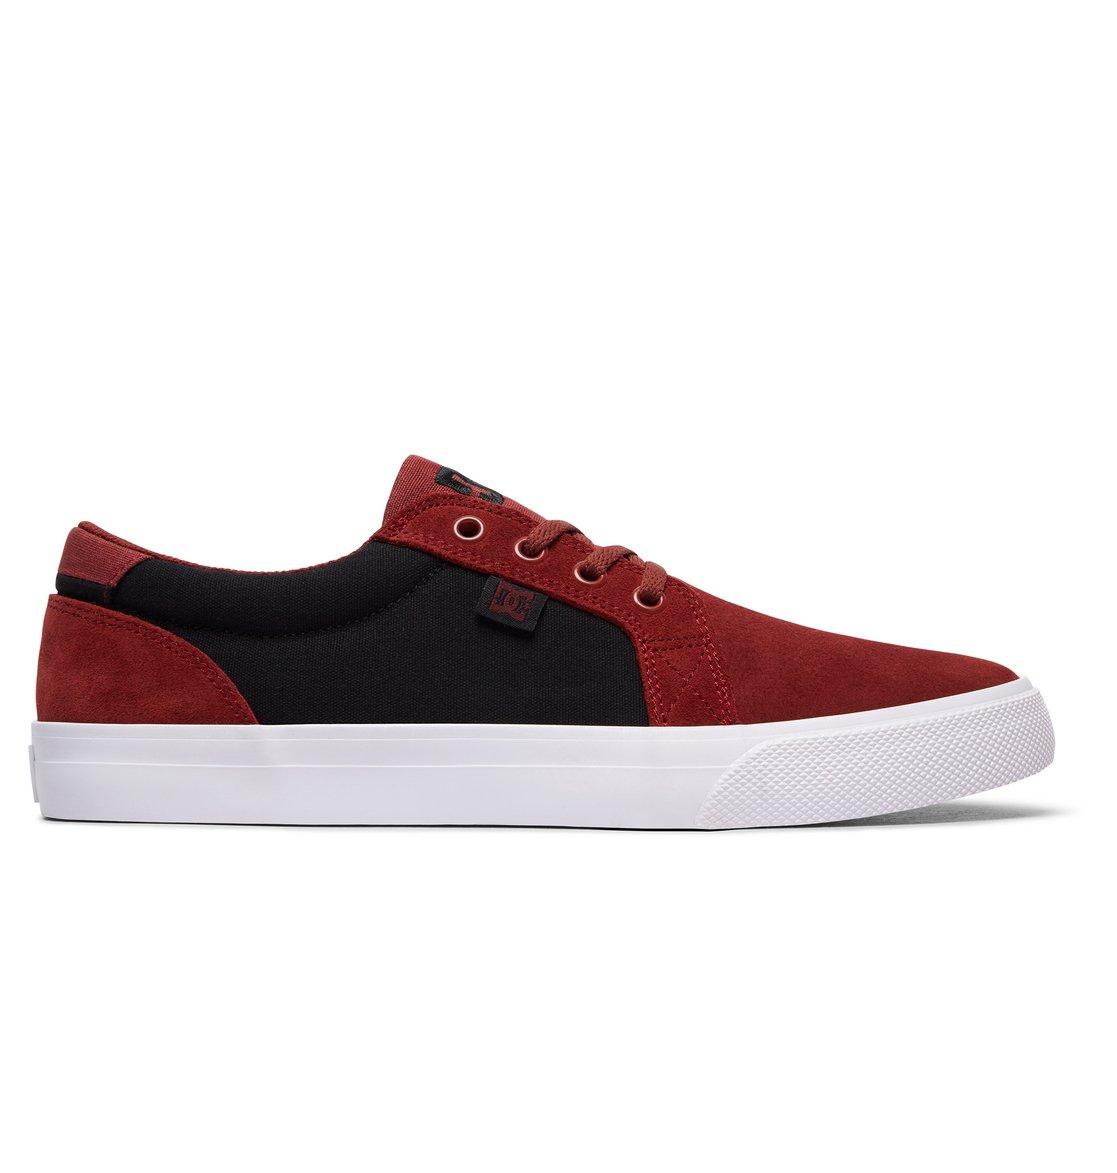 DC Dctrase TX - Zapatillas Hombre, Color Rojo, Talla 5.5 UK